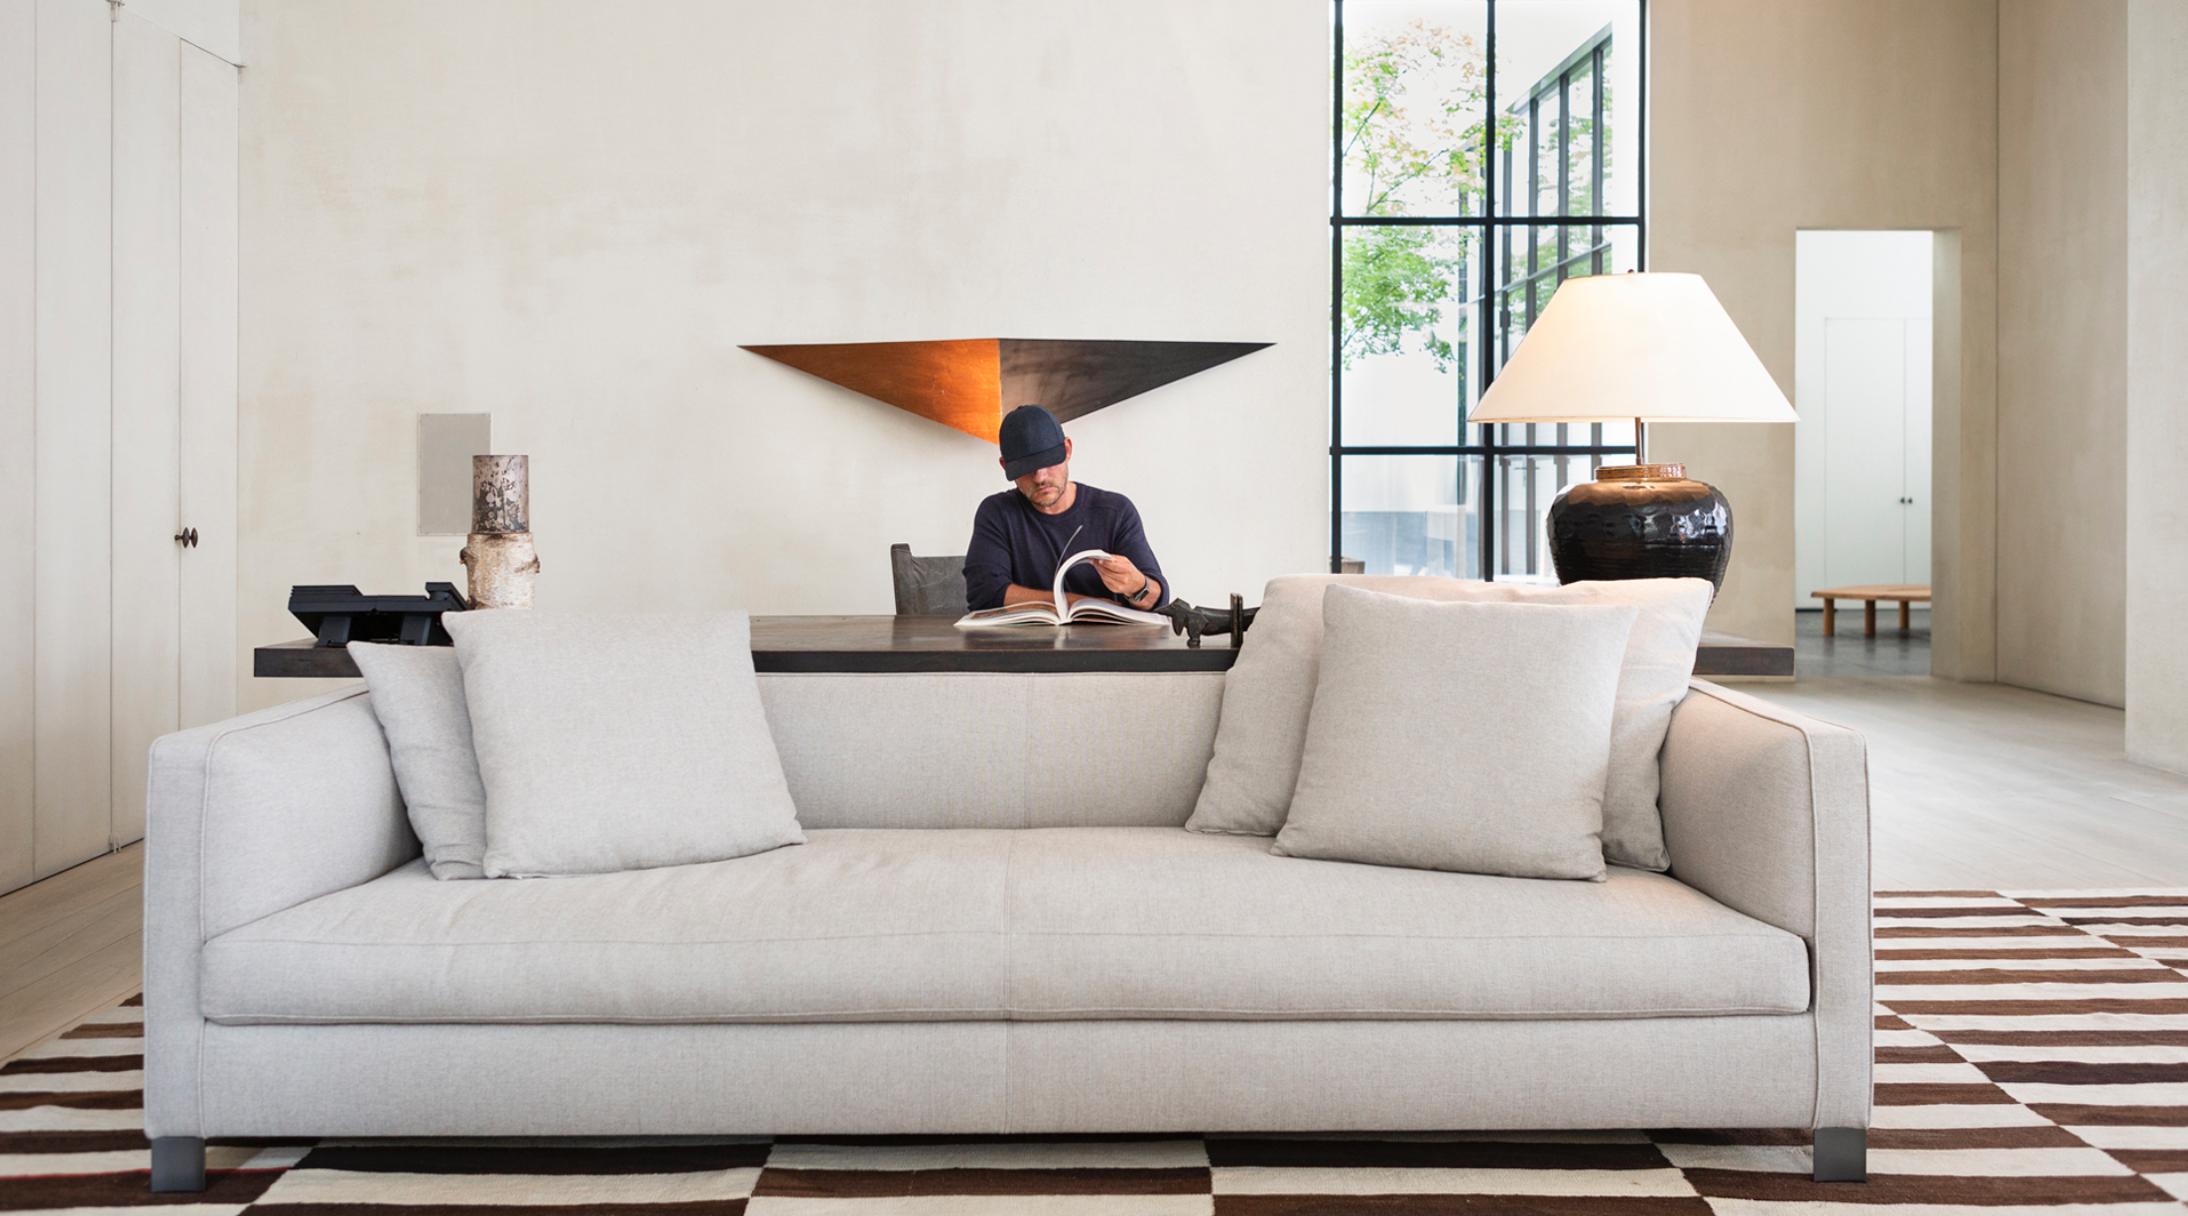 Loncin Interieur | A Beautiful Home - Thuis